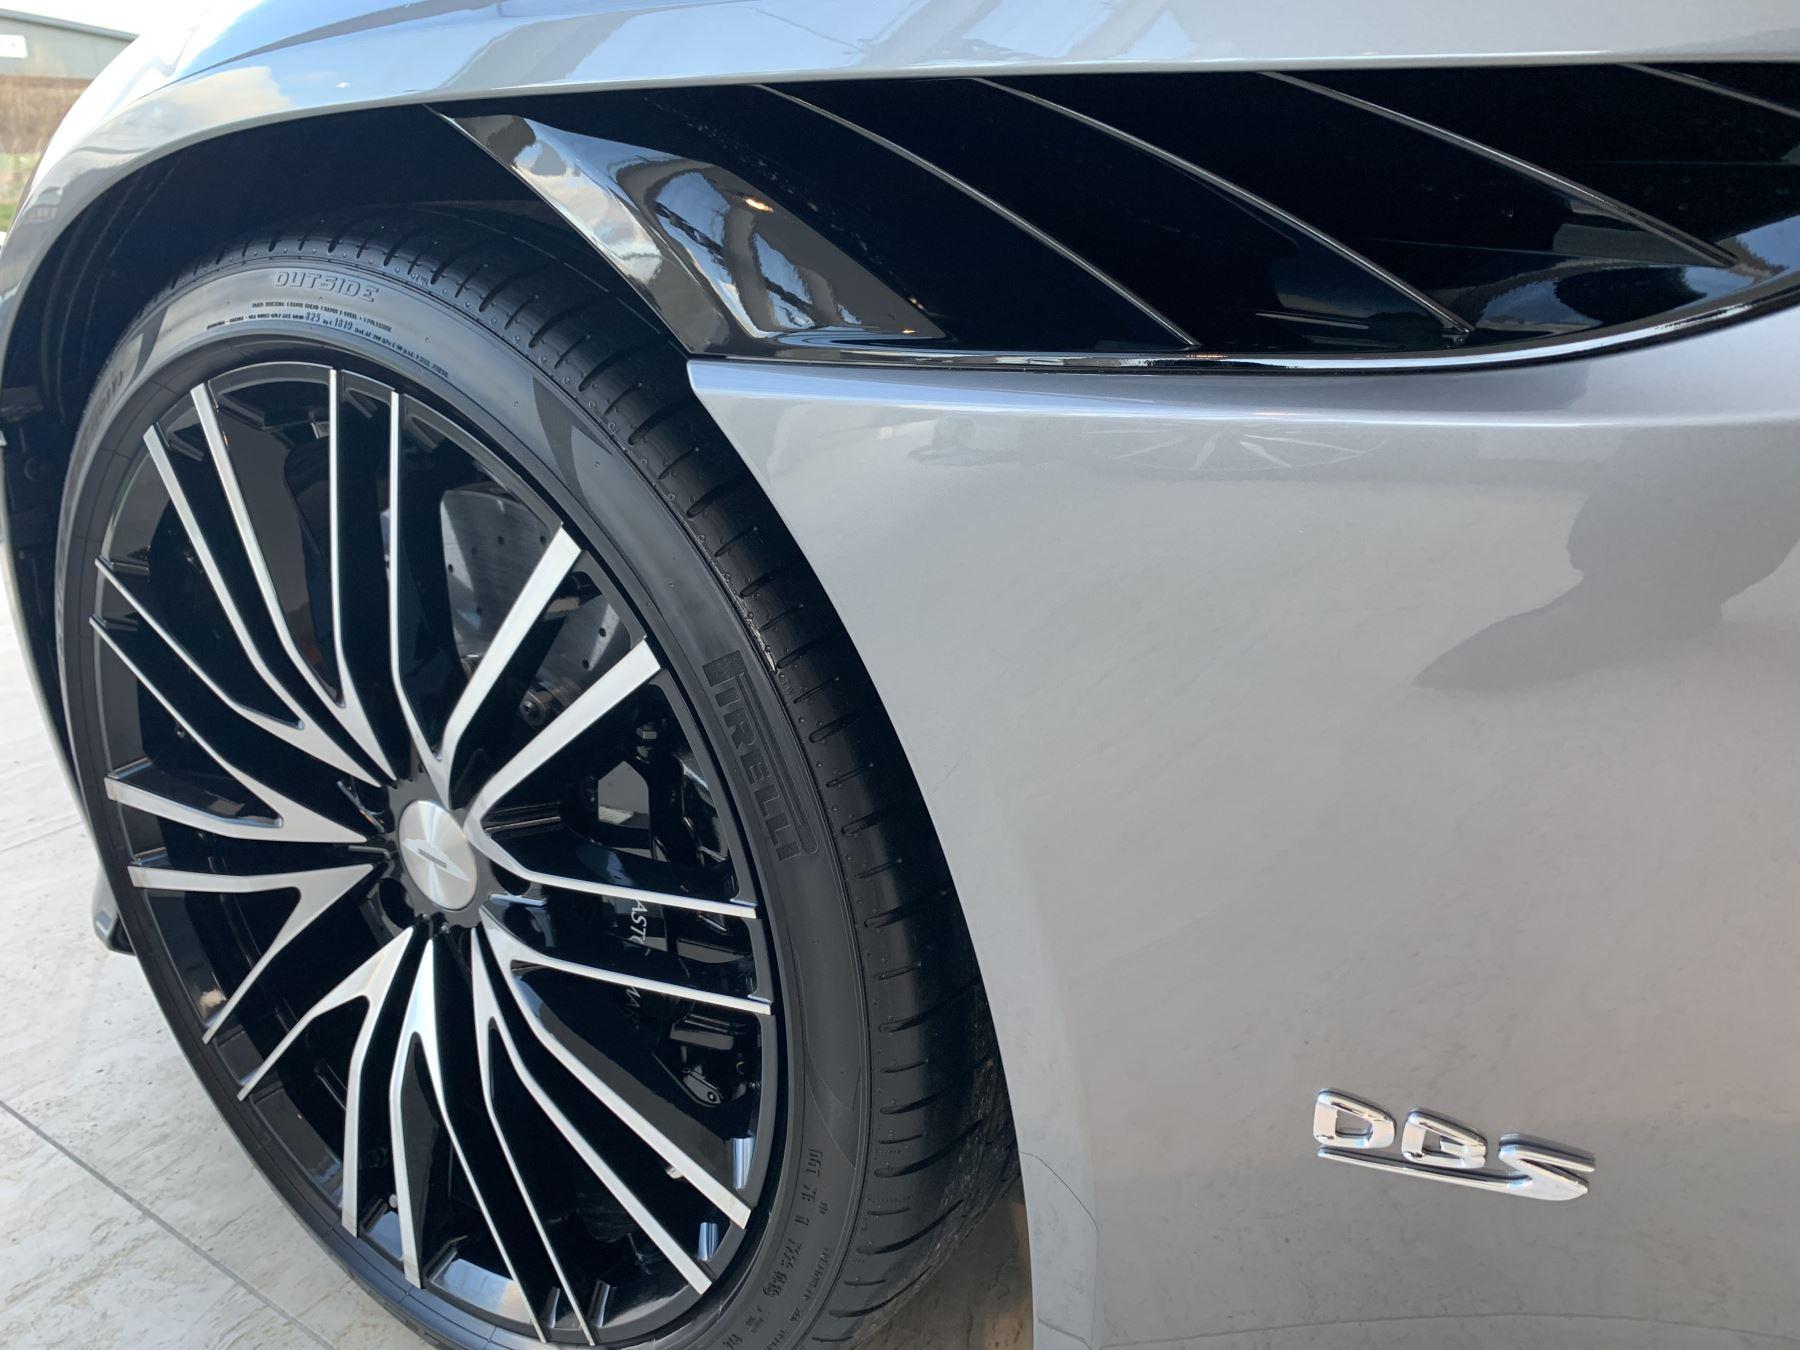 Aston Martin DBS Superleggera V12 Superleggera 2dr Touchtronic Auto image 4